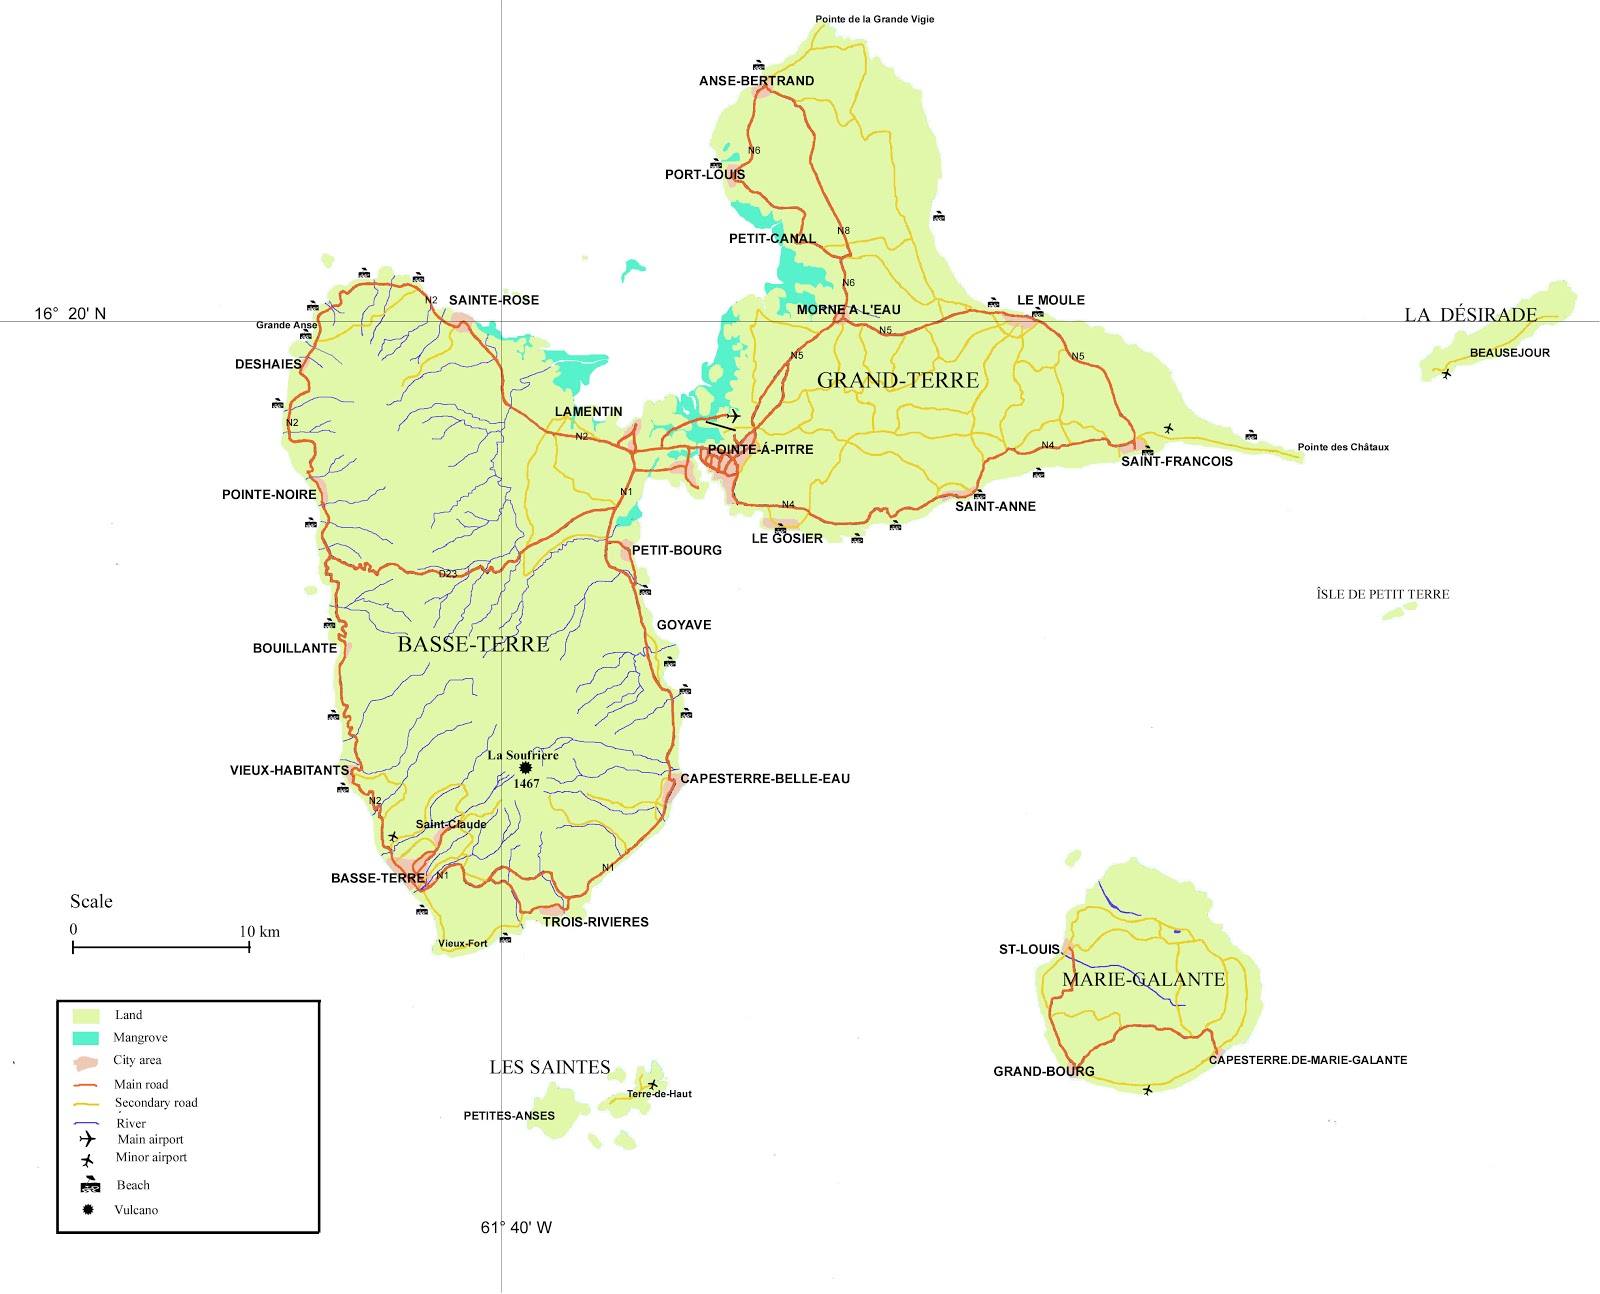 Mapas de Guadalupe | França